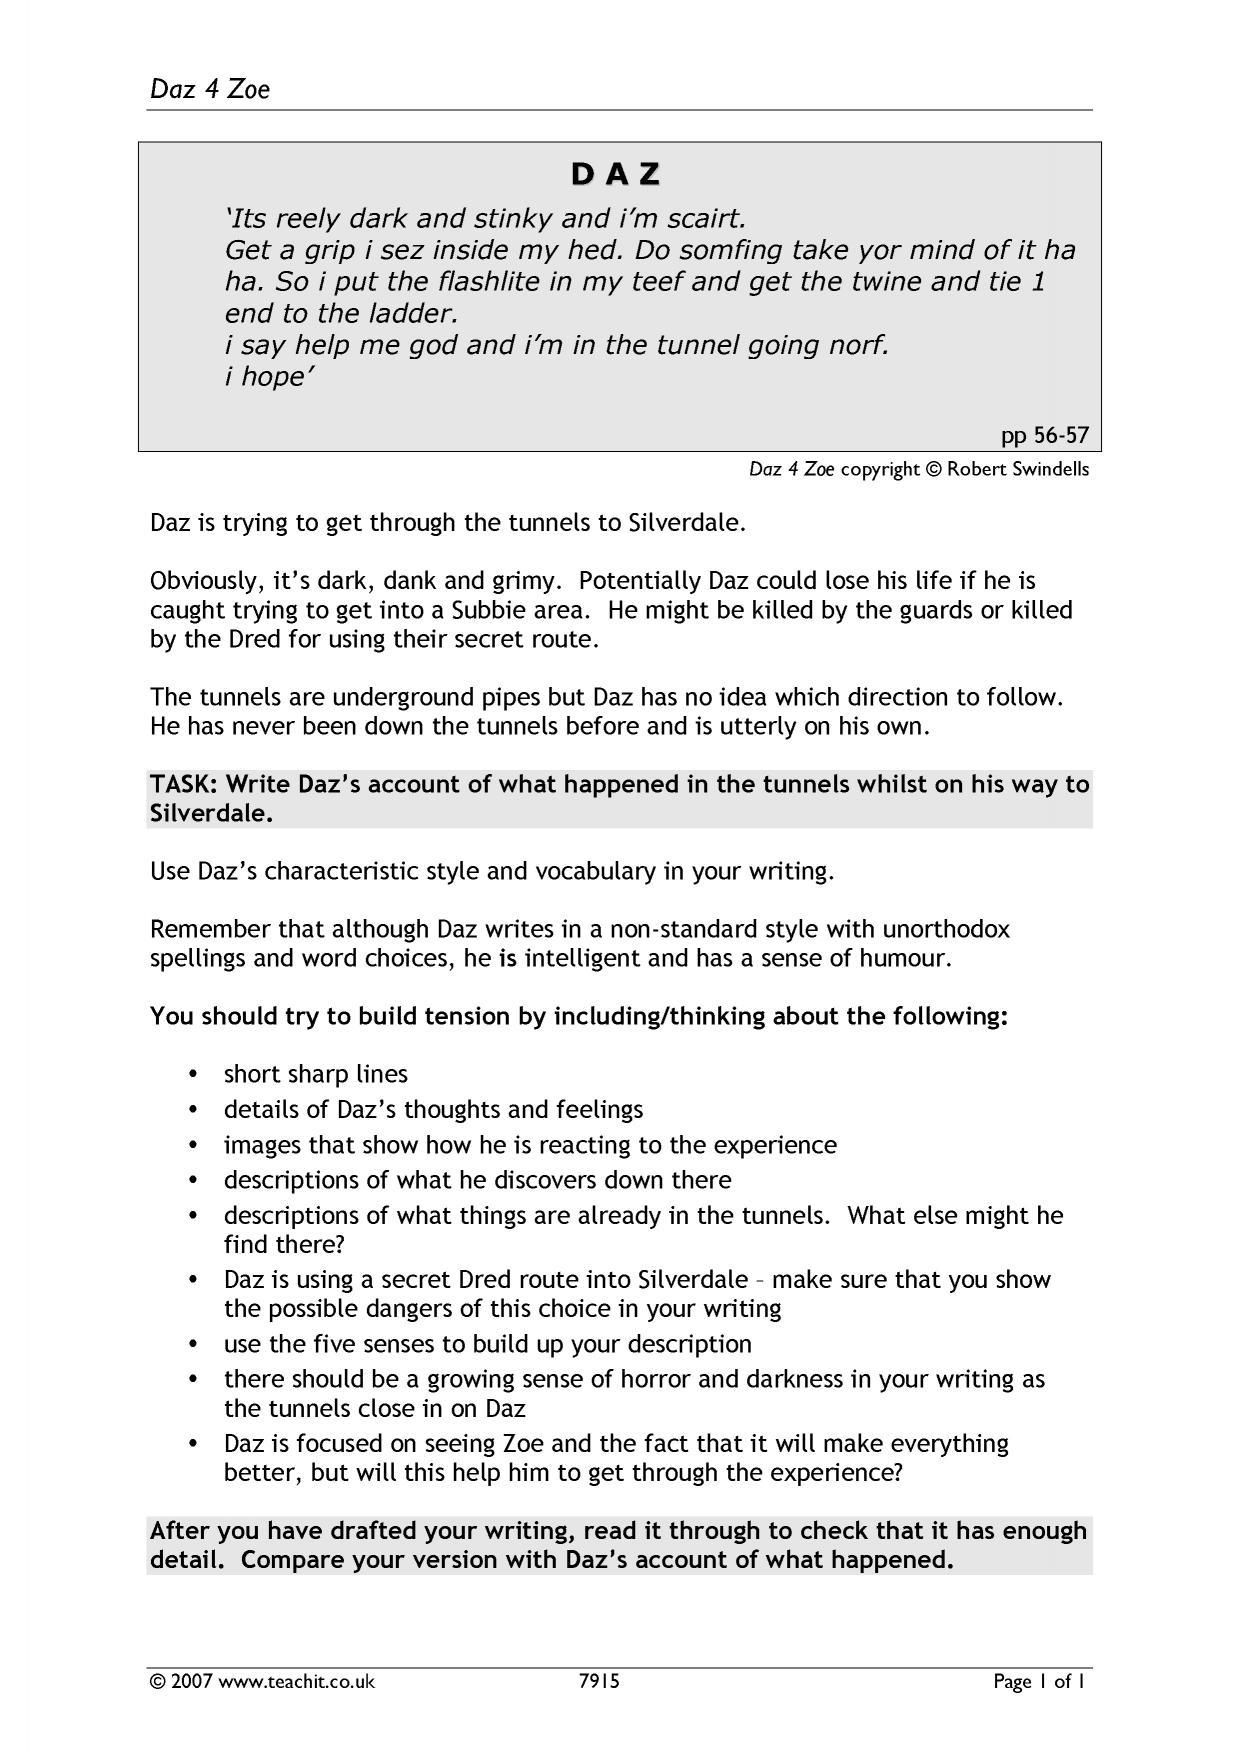 200 300 word essay